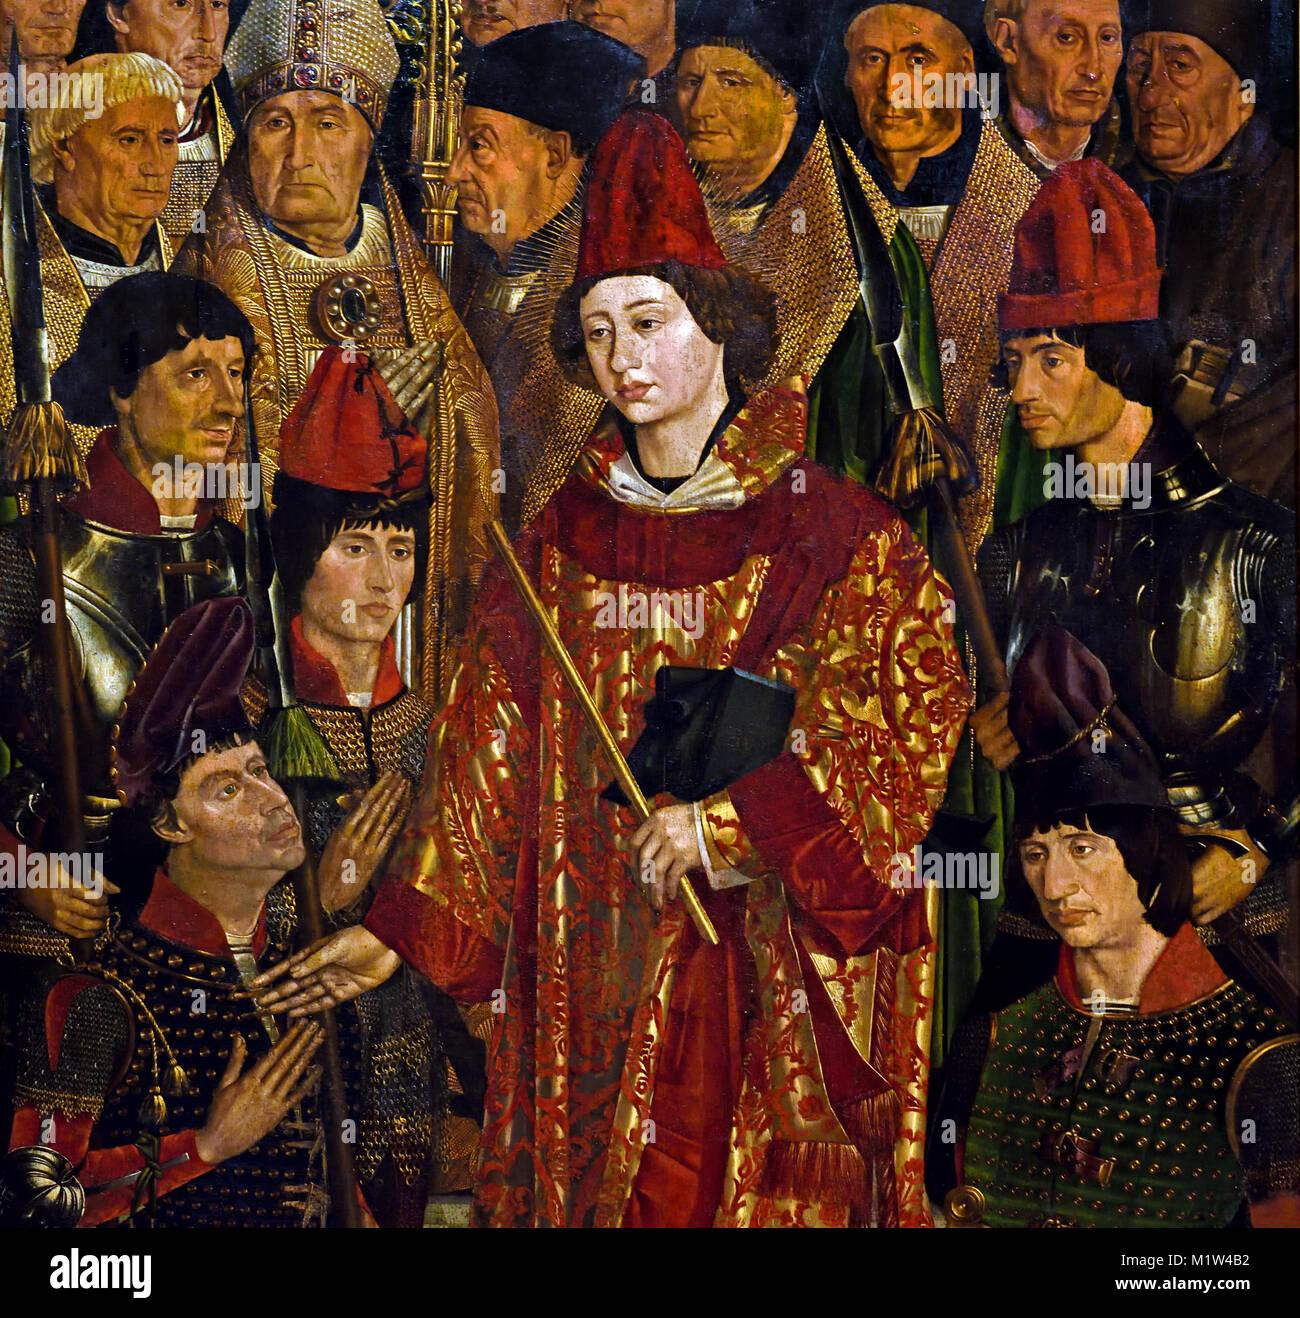 The Saint Vincent Panels - Adoration of Saint Vincent panels 1450 Nuno Gonçalves, who was active from 1450 - Stock Image